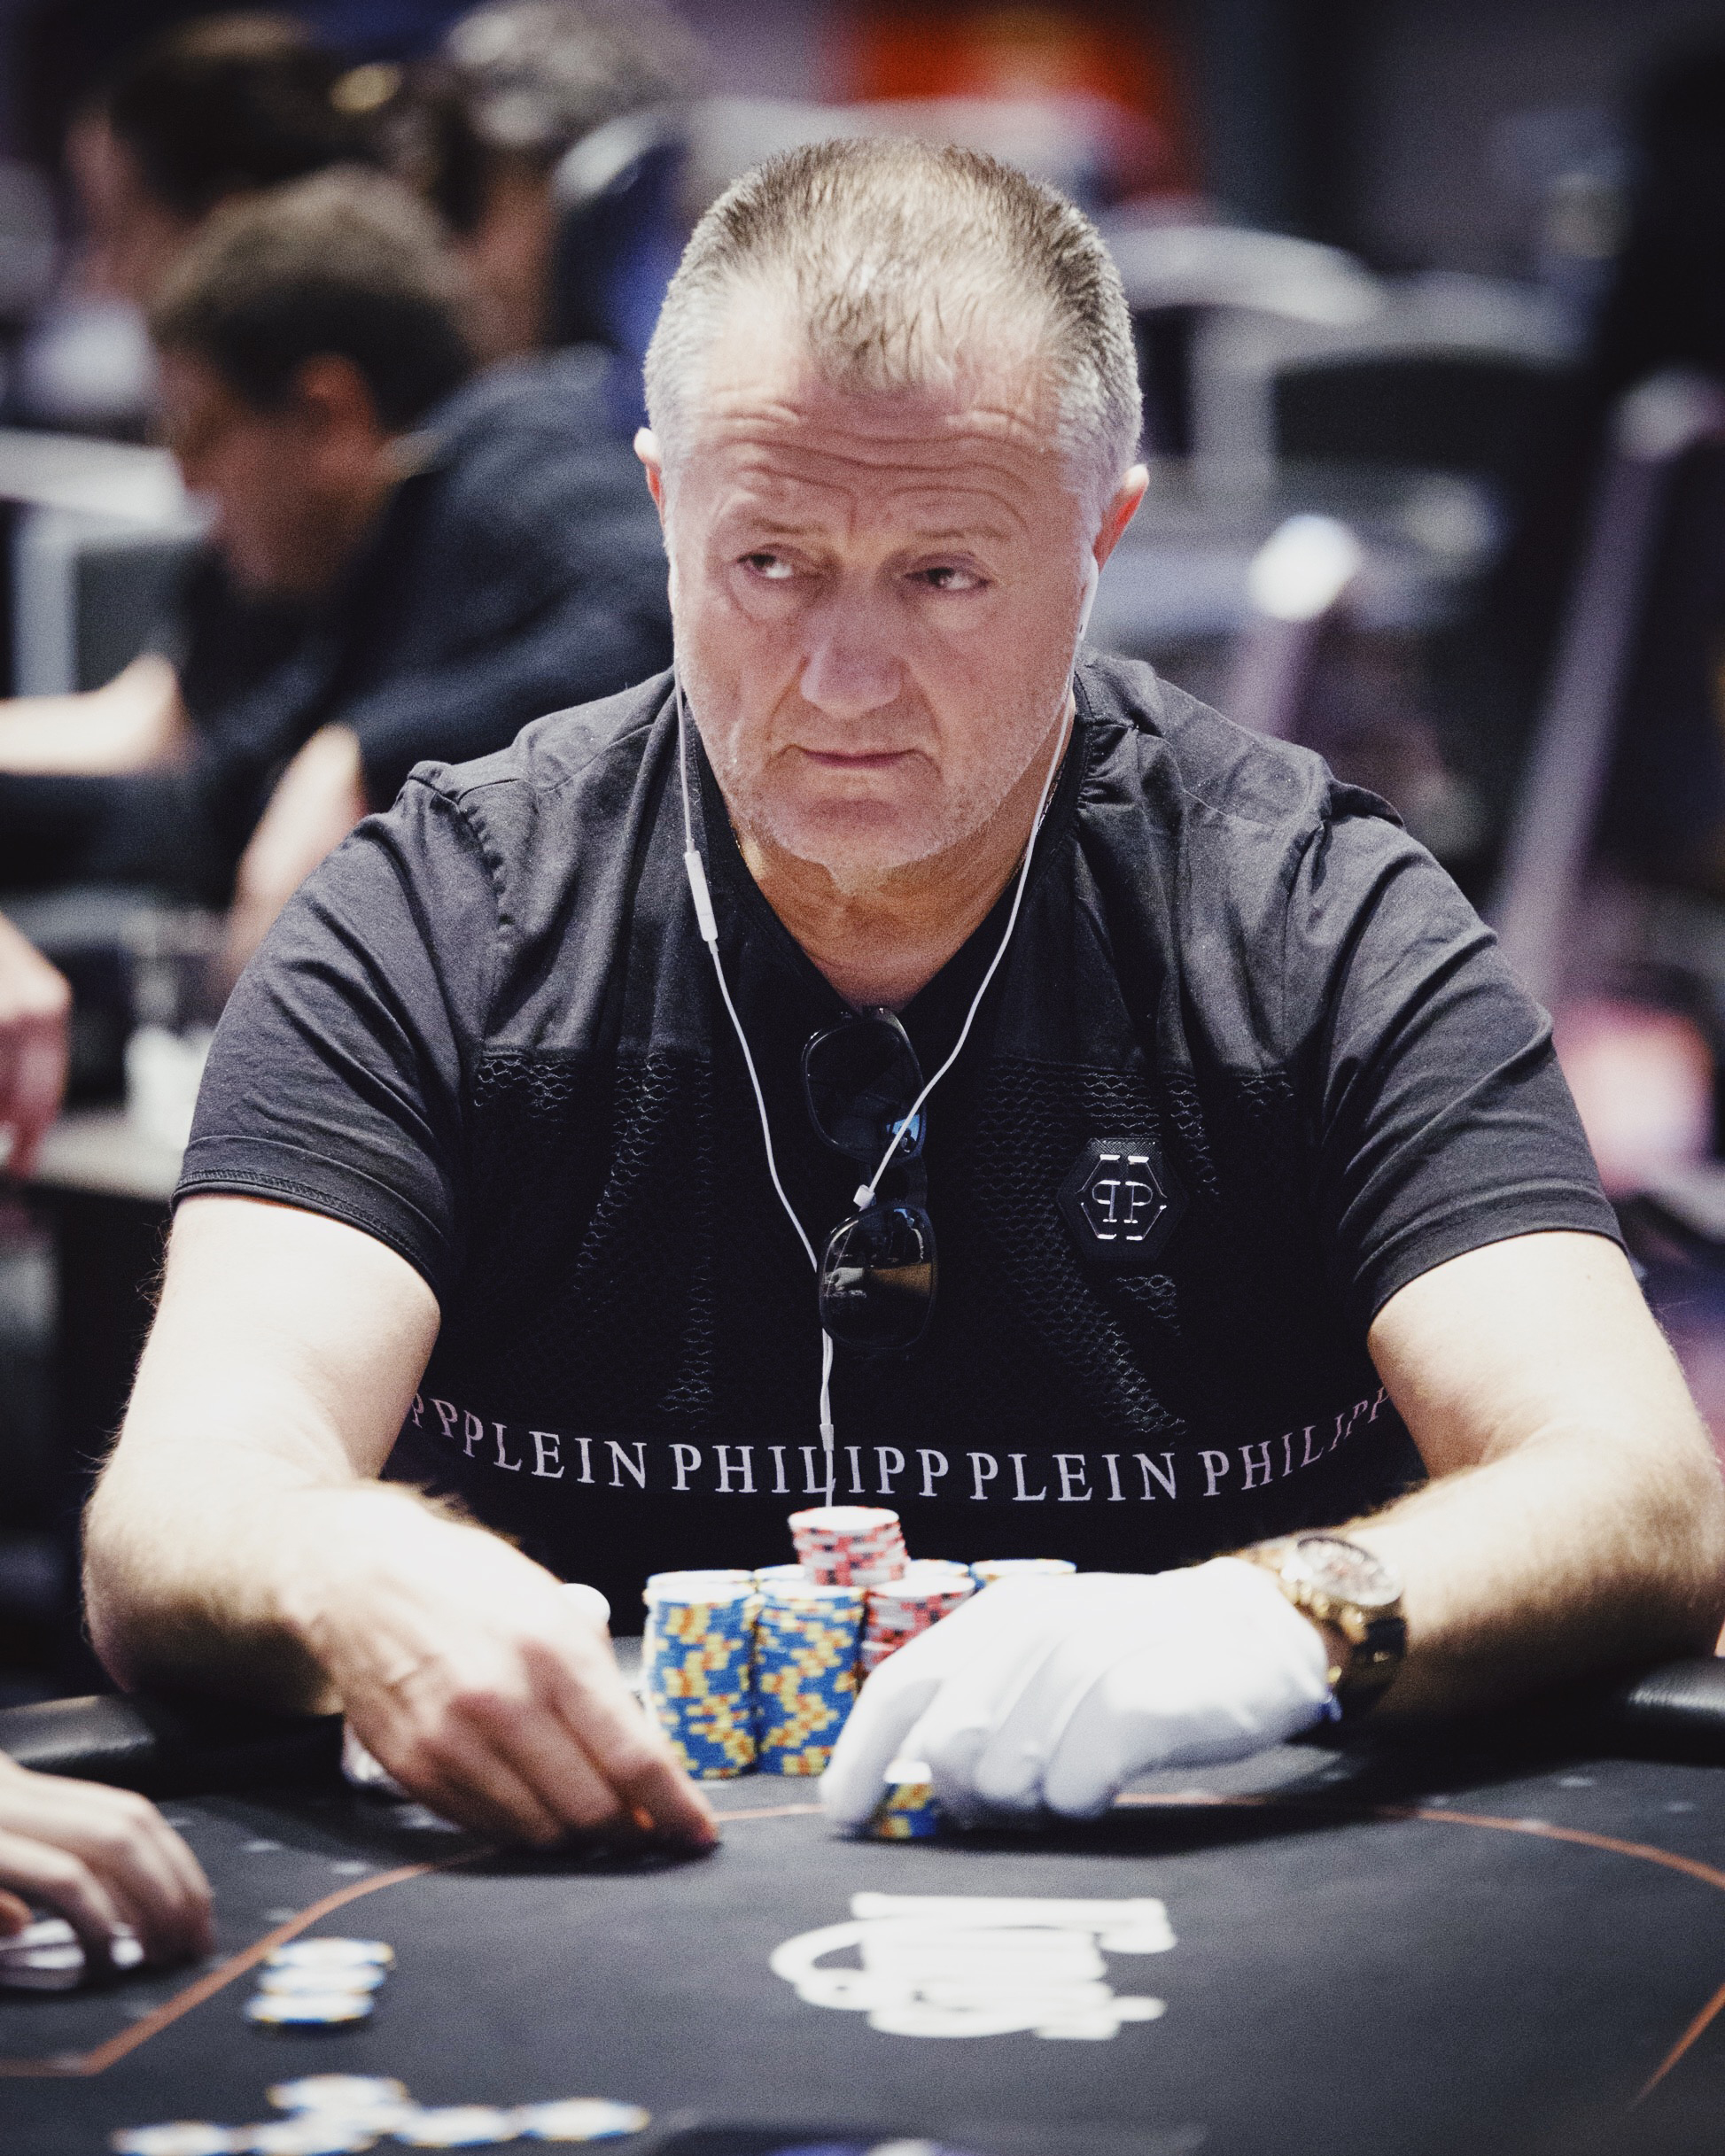 polina-shubkina-poker-008.JPG